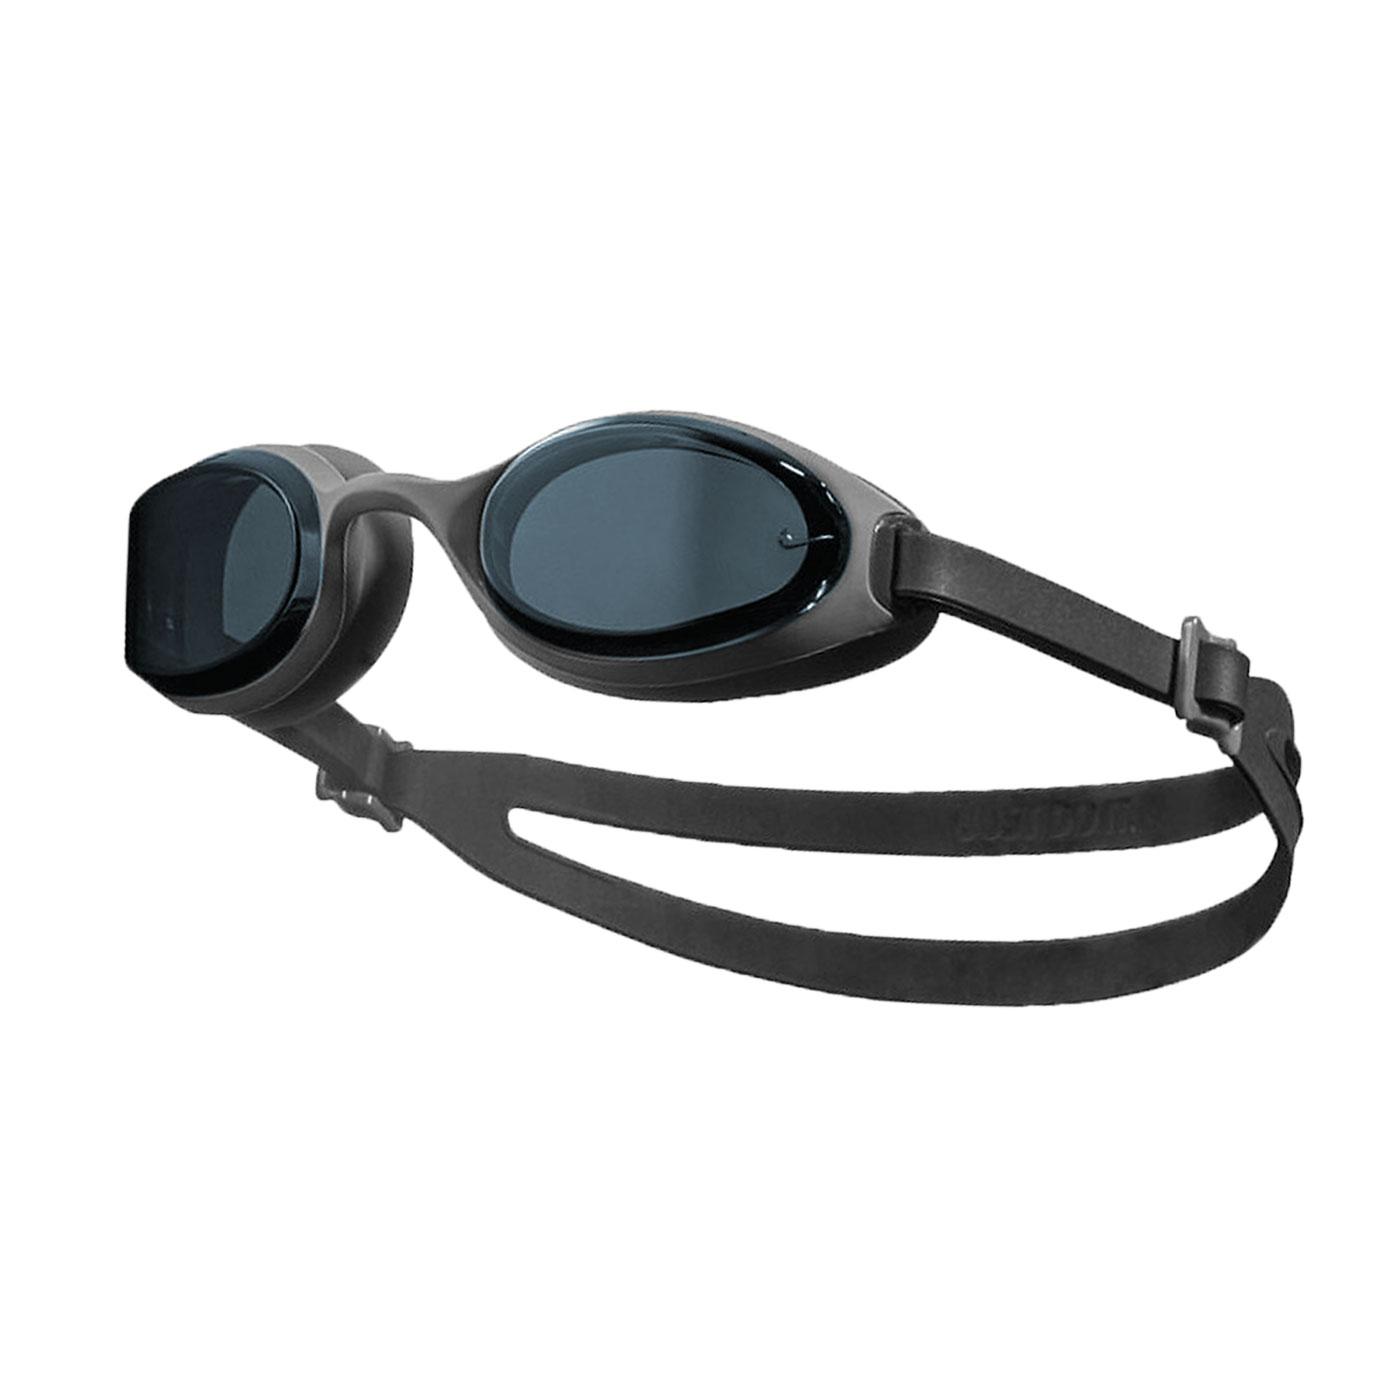 NIKE SWIM 成人訓練型泳鏡 NESSA182-014